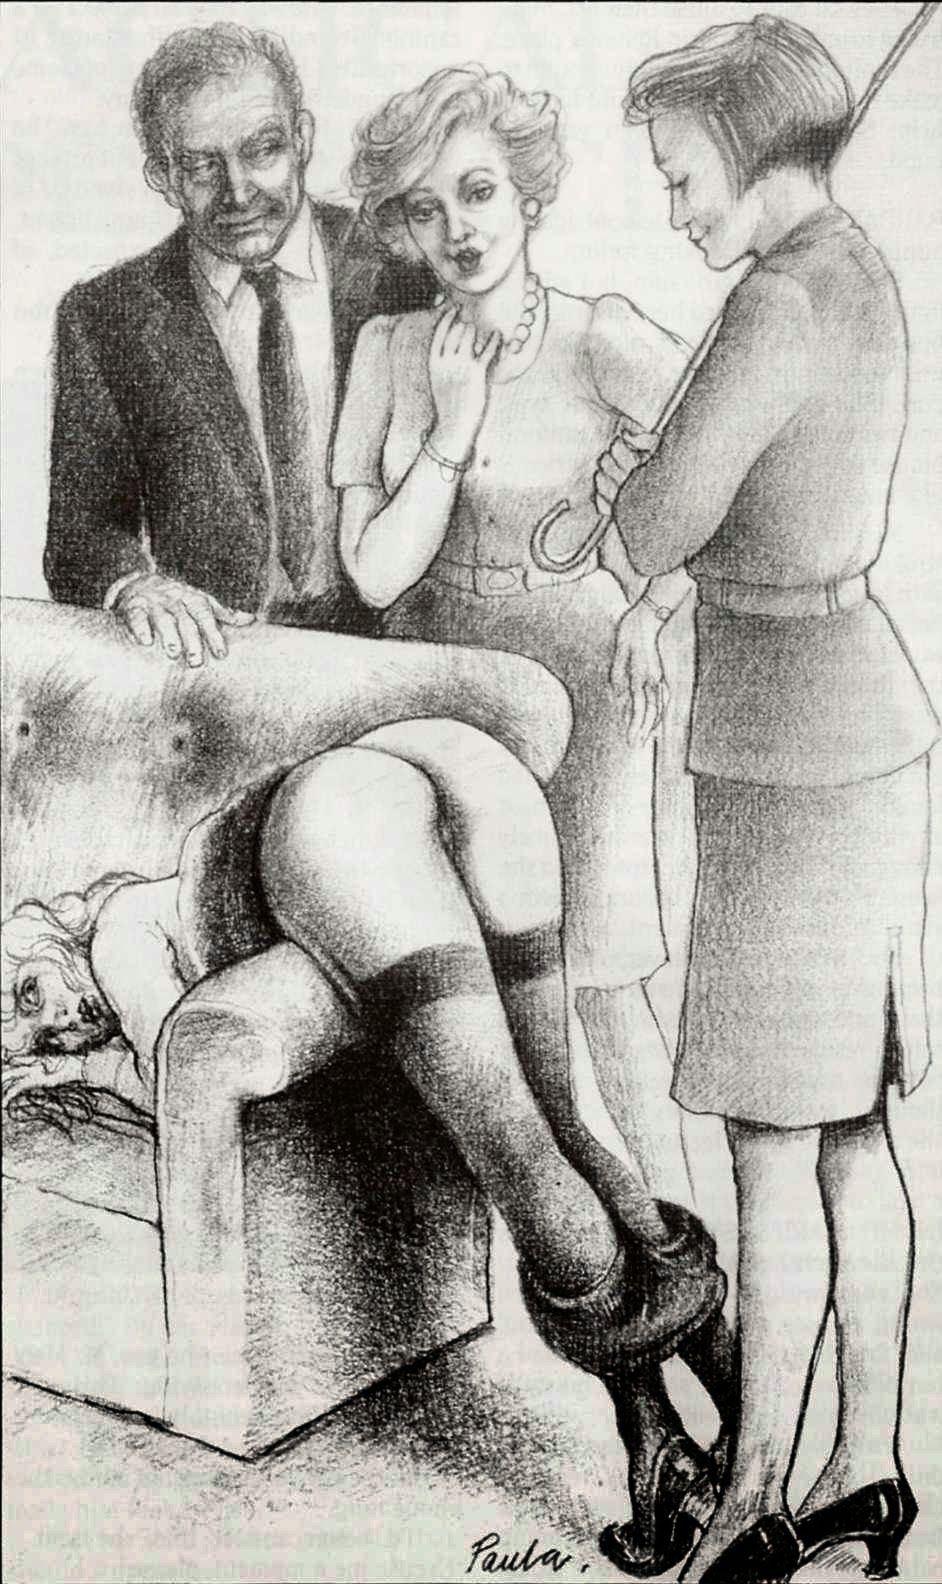 Ribeye reccomend uniform spanking